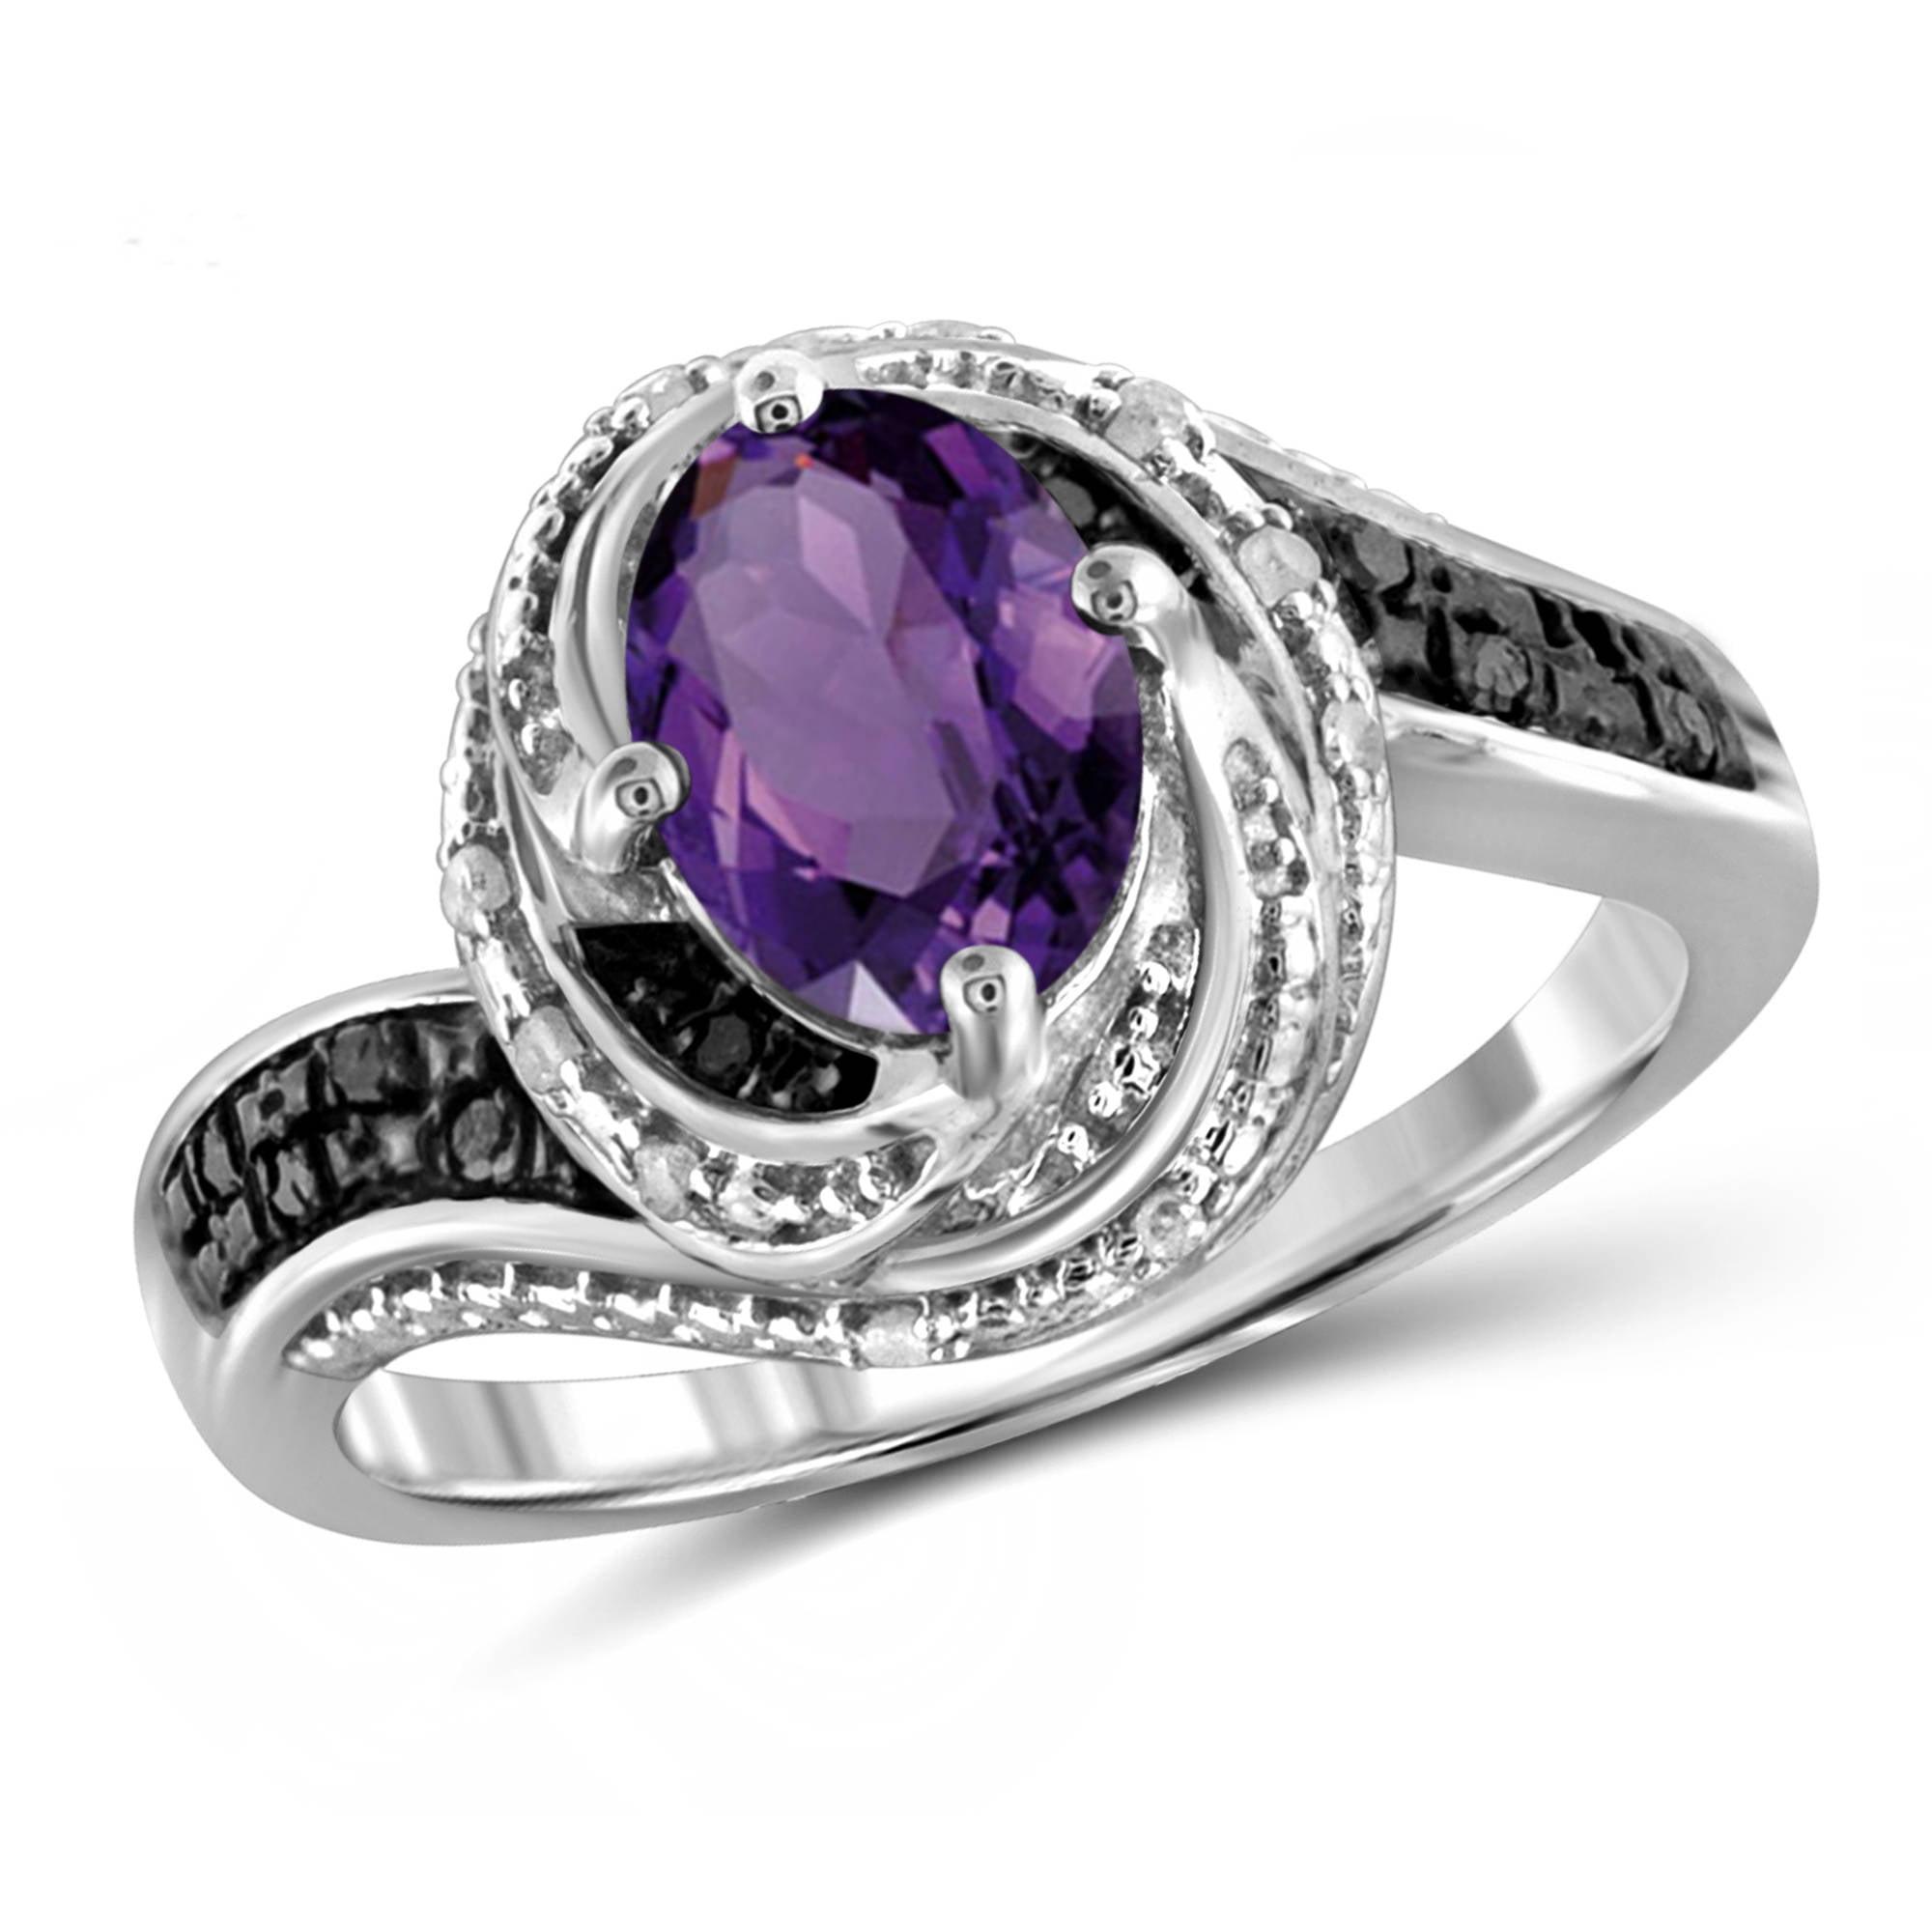 JewelersClub 1.35 Carat Amethyst Gemstone and 1/10 Carat Black and White Diamond Ring